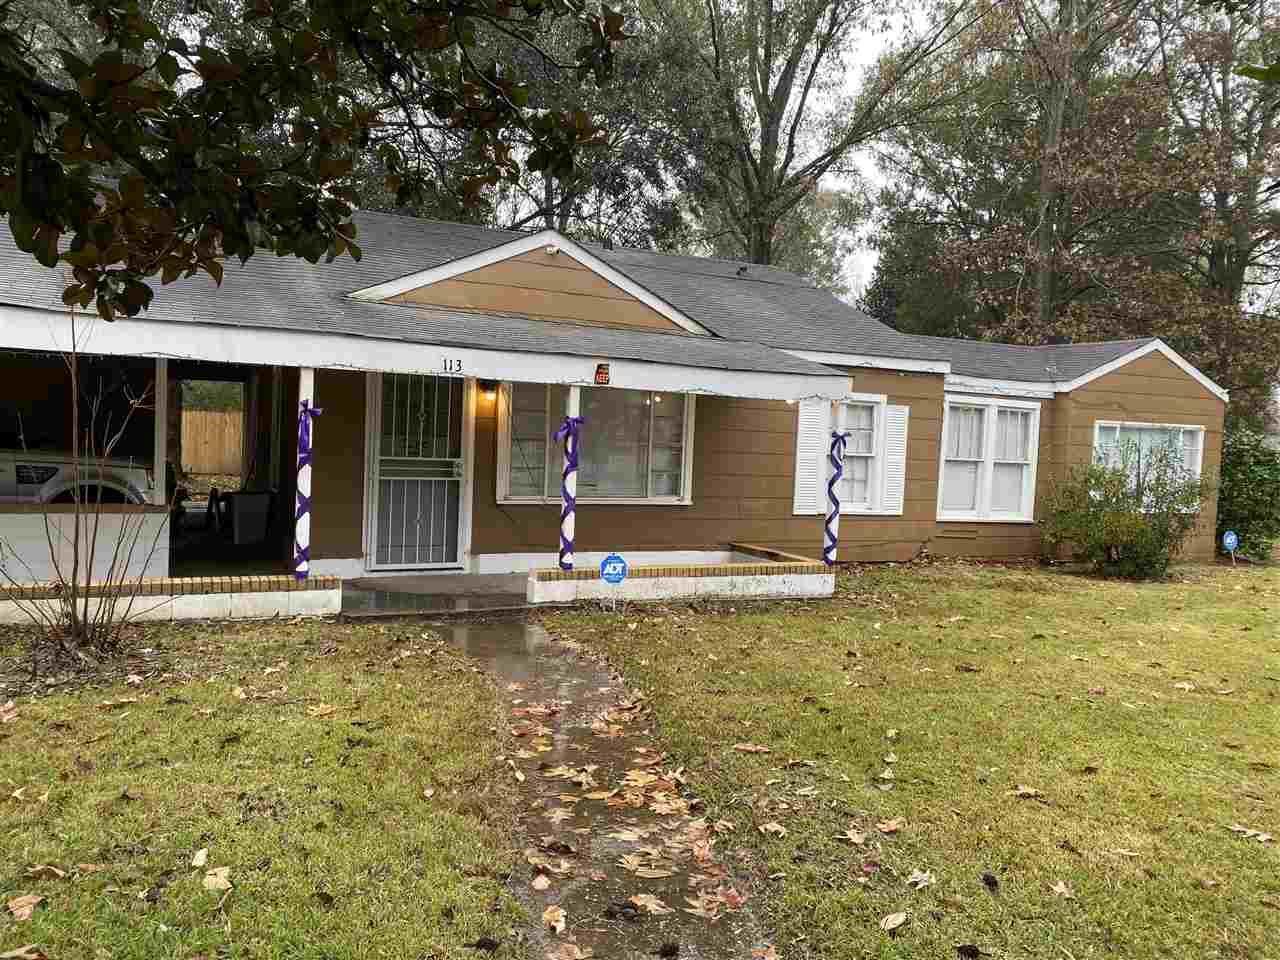 113 SAVANNA ST, Jackson, MS 39212 - MLS#: 336957